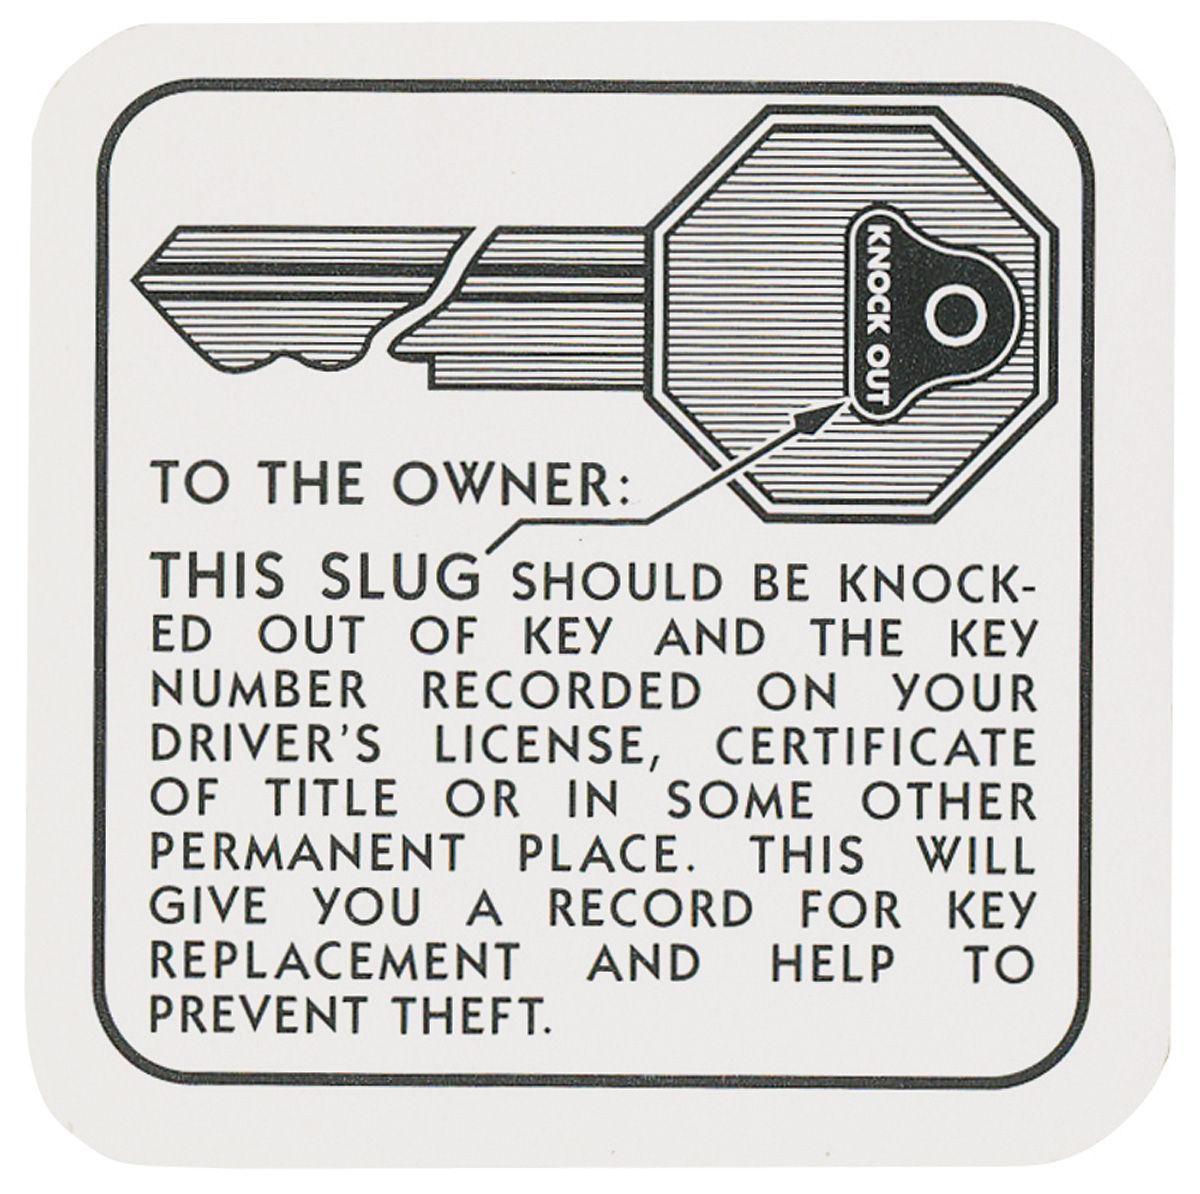 Decal, 54-55 Cadillac, Glove Box, Key Knockout Instruction